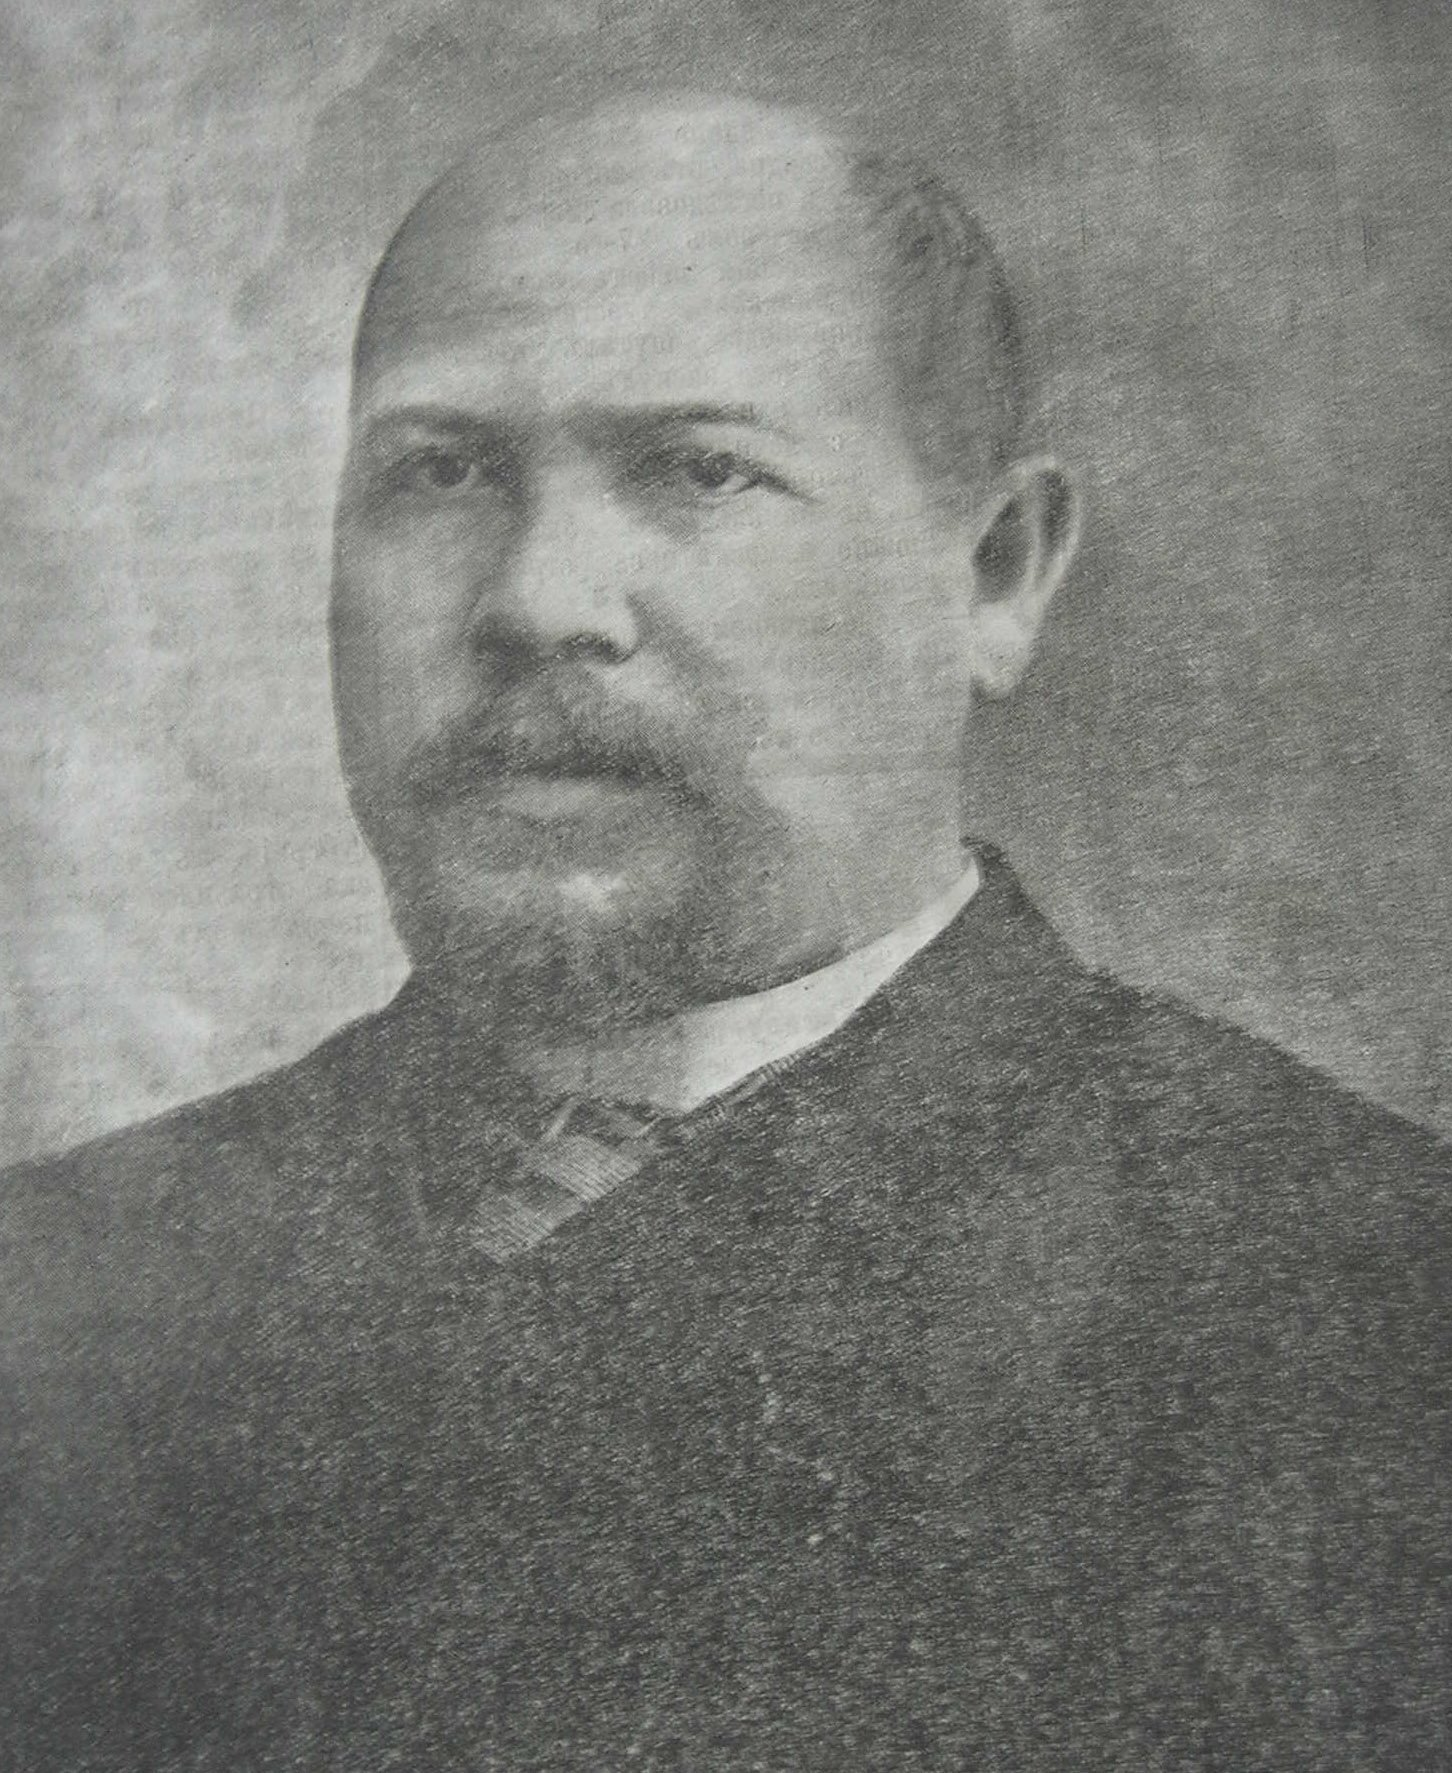 Иван Парфенович Горизонтов